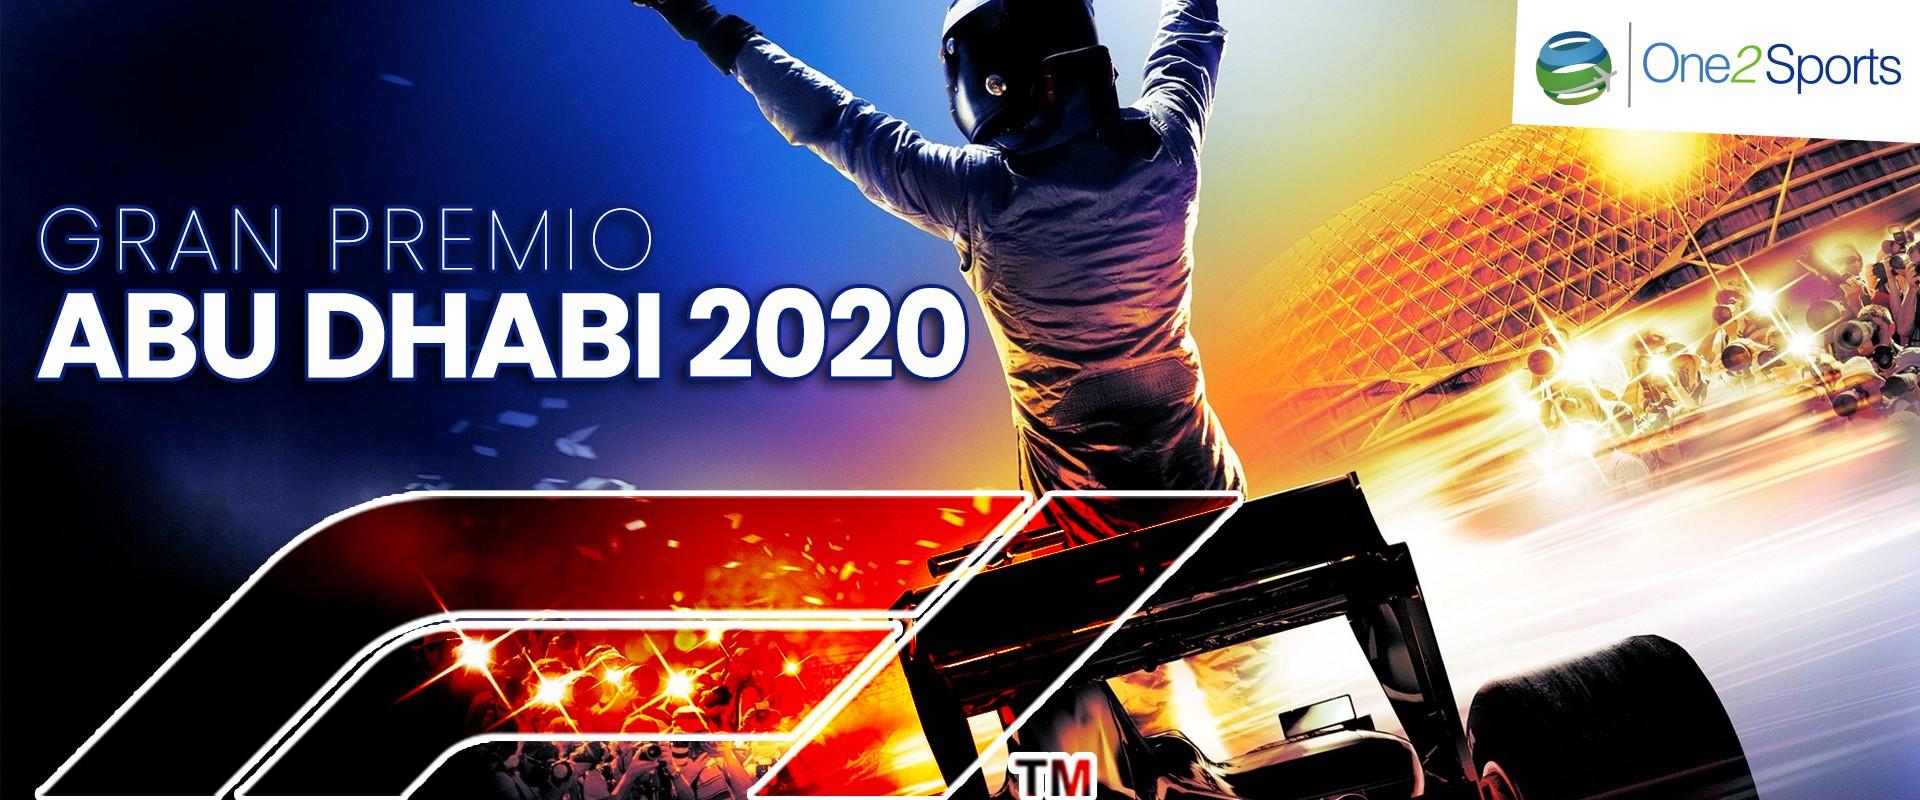 Gran premio Abu Dhabi 2020